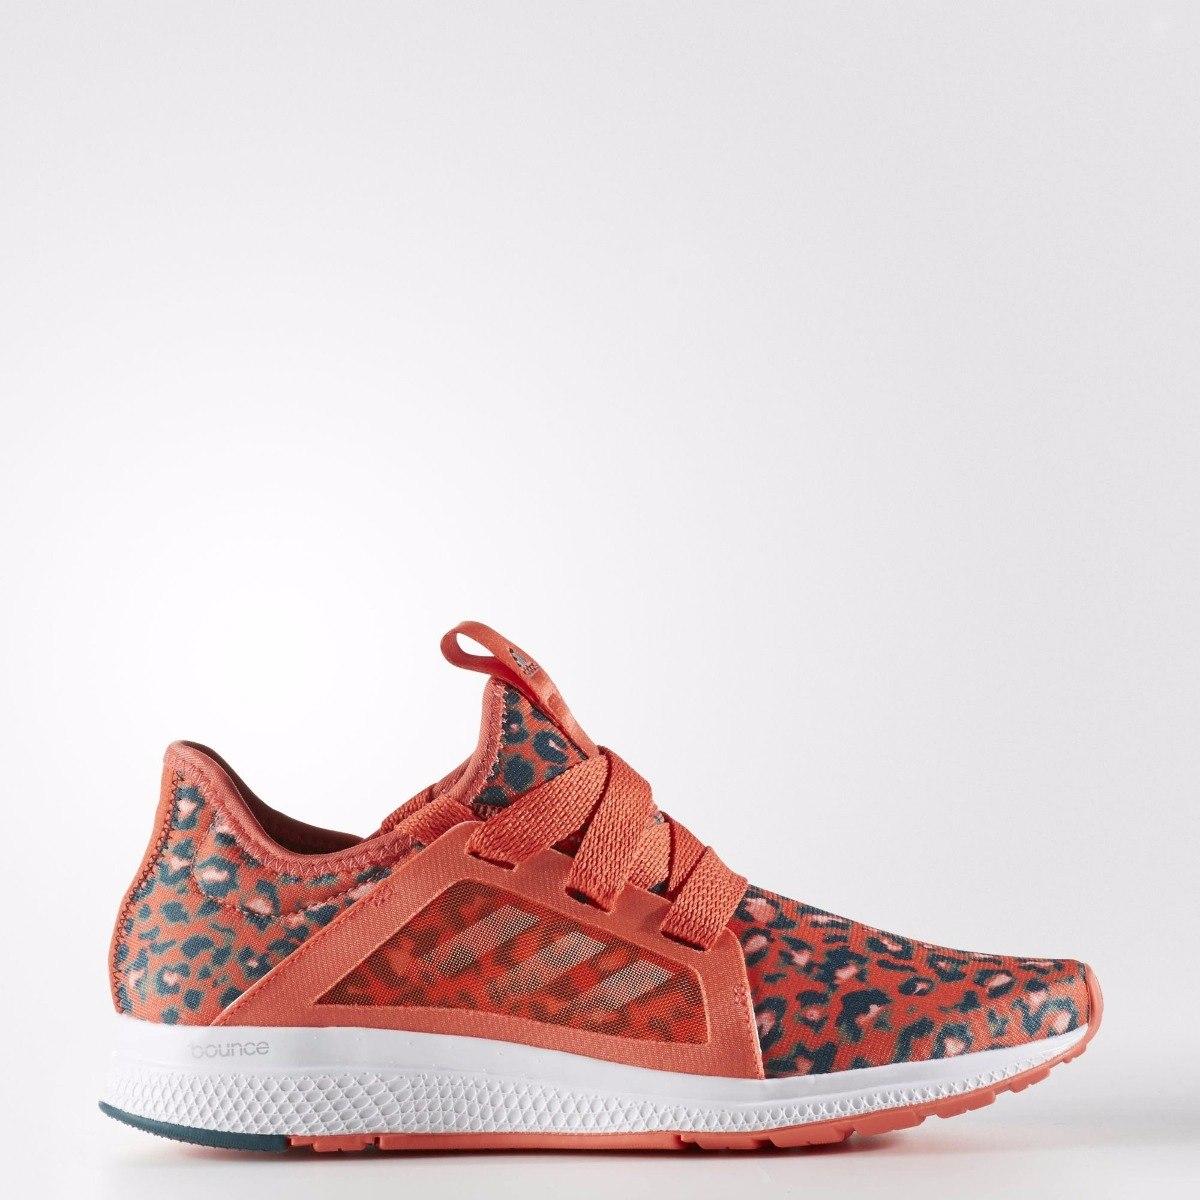 sale retailer 3ffae e62f2 zapatillas adidas edge lux w running dama talle 35 al 40. Cargando zoom.